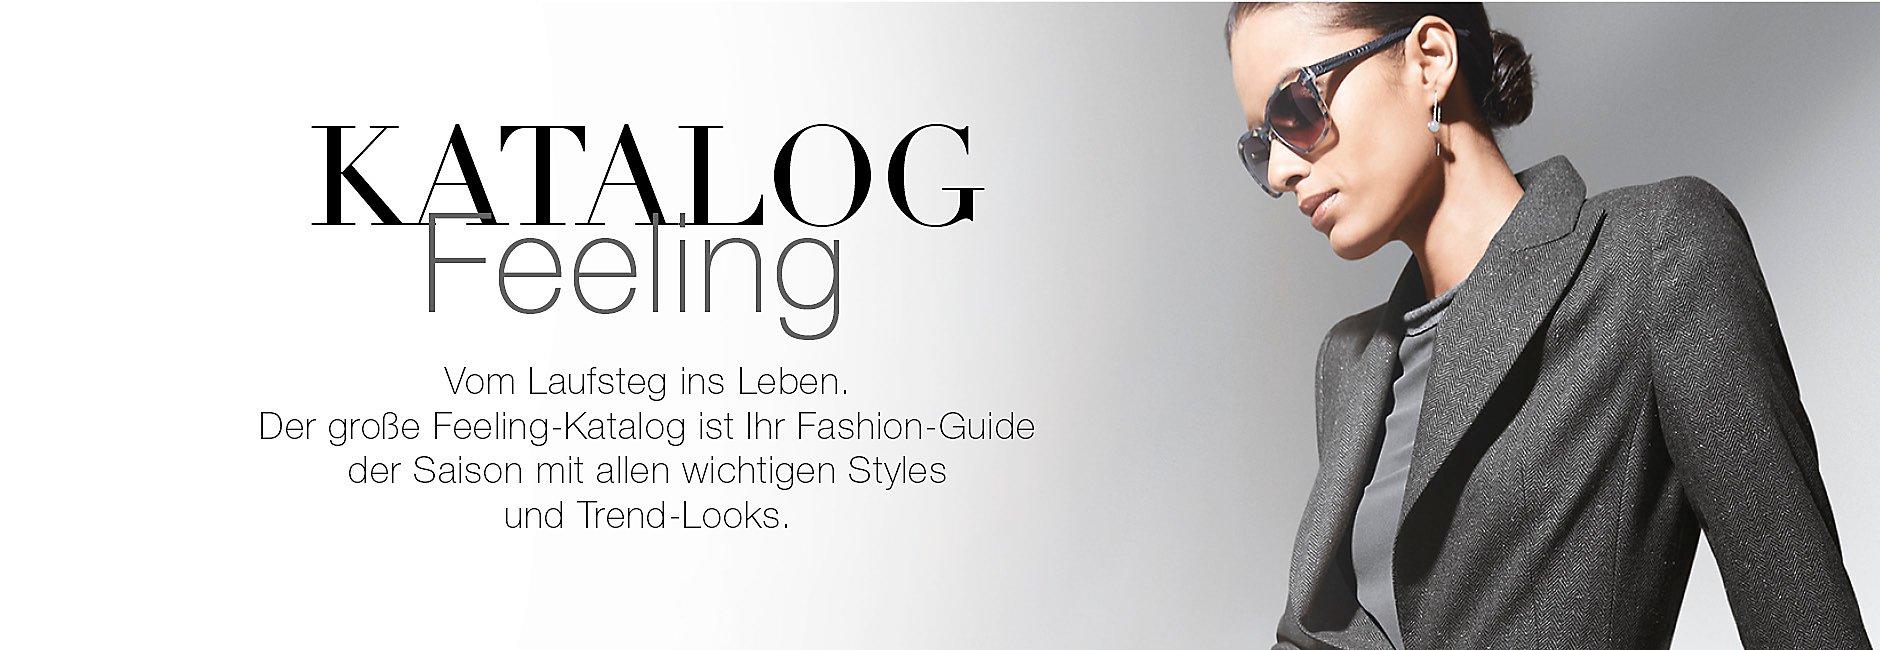 AT_Kataloge_Feeling_d.jpg